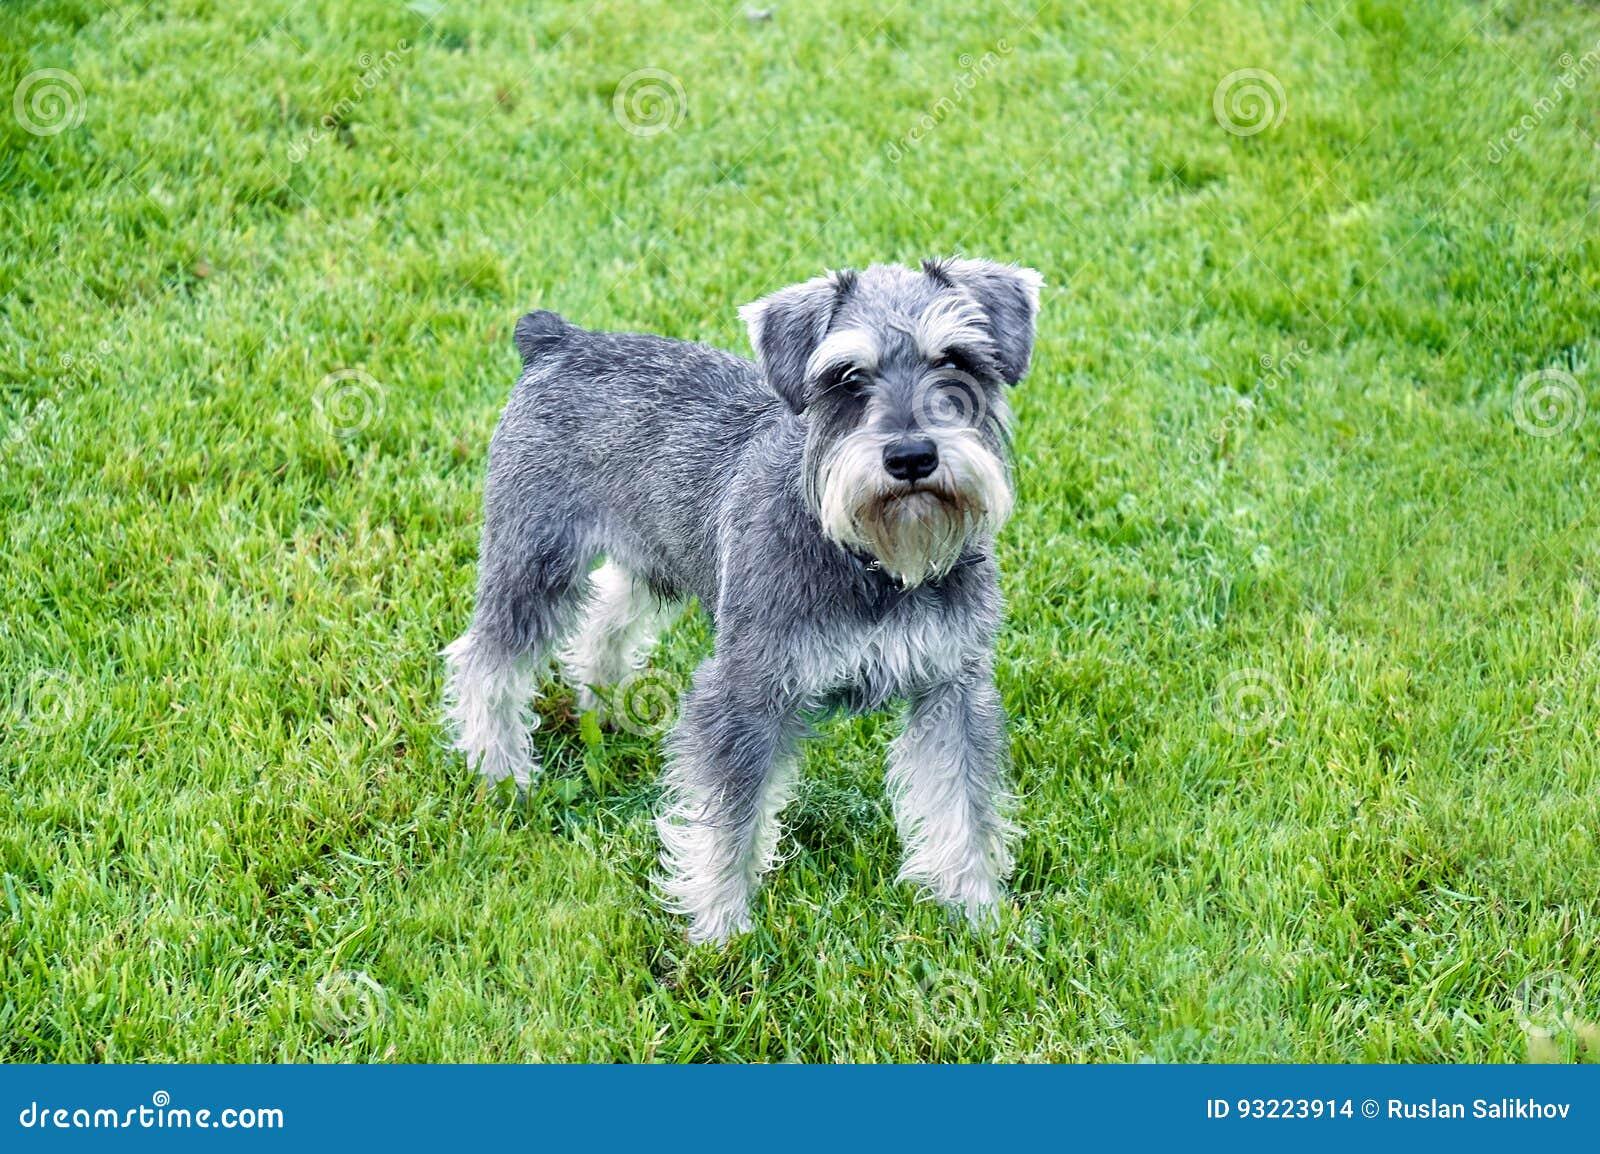 Schnauzer stands in the grass